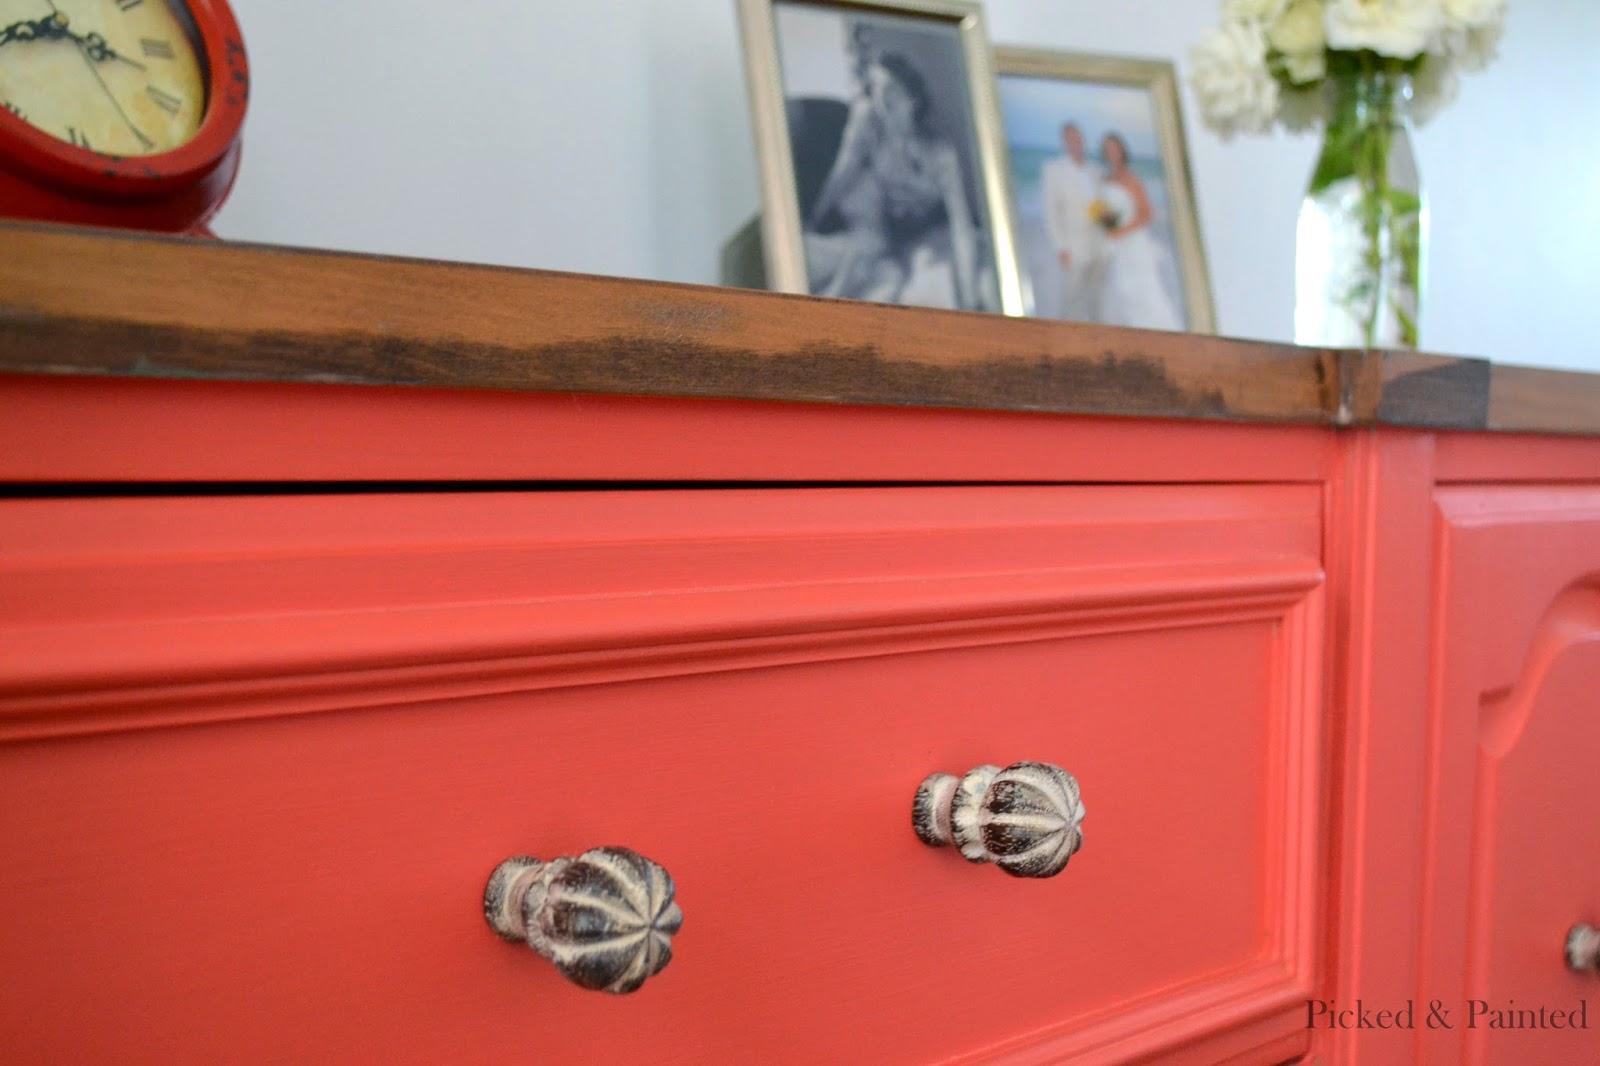 Coral Furniture Paint Helen Nichole Designs 07 2014 08 2014